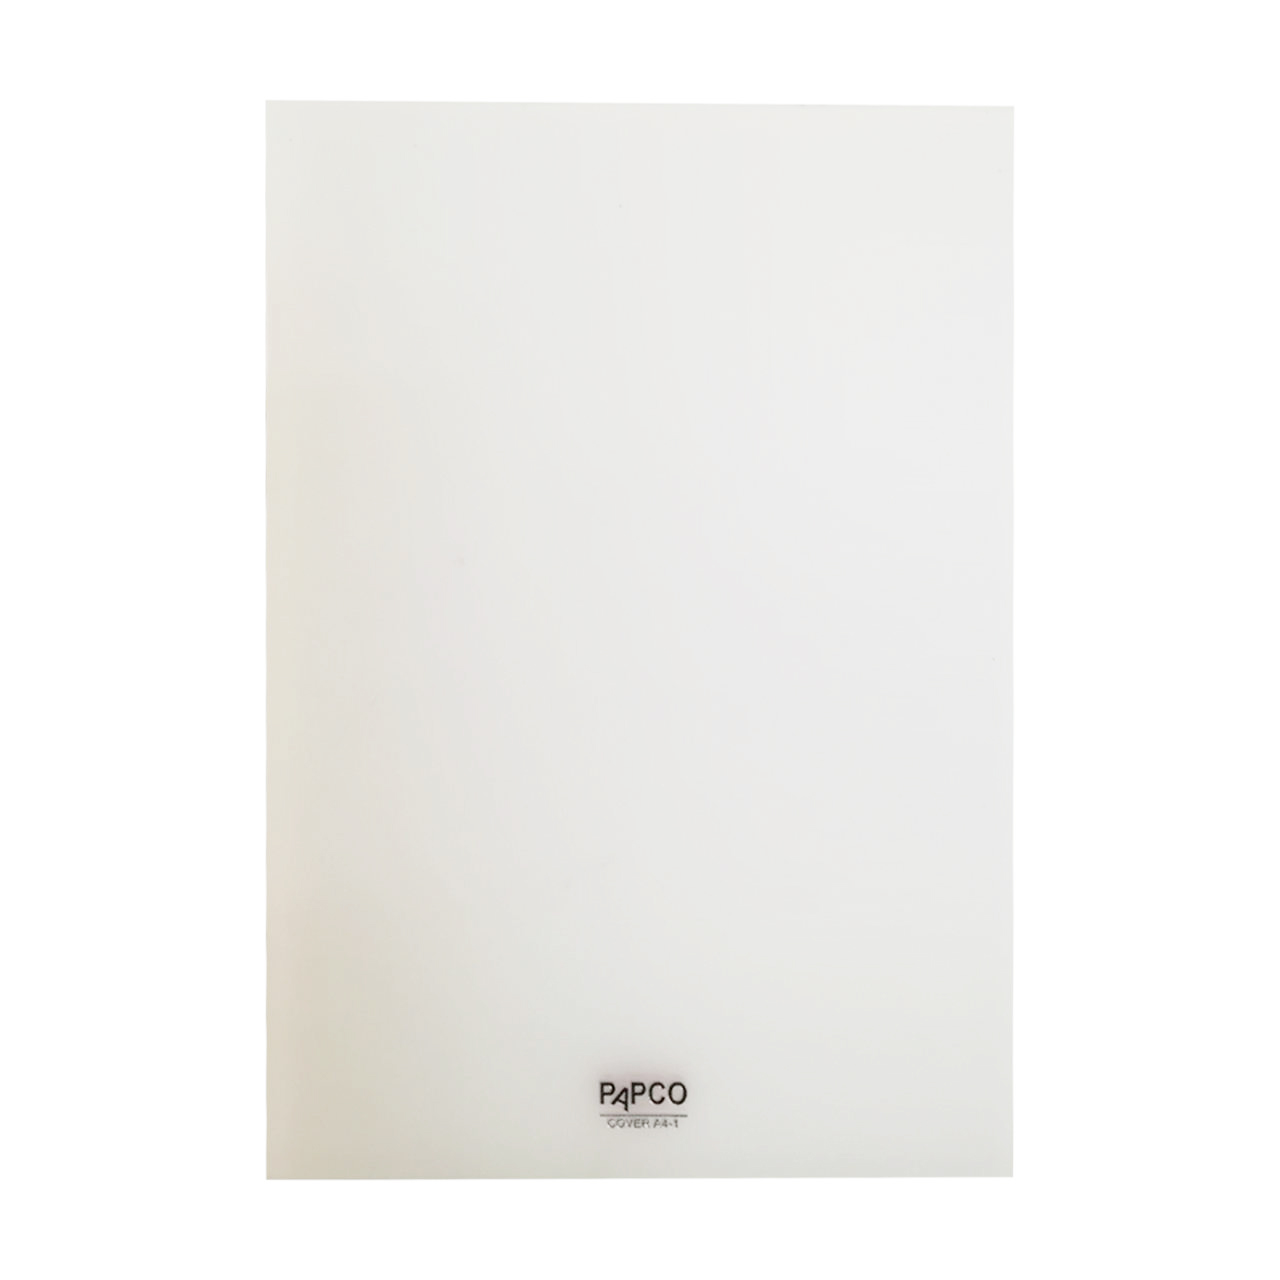 قیمت خرید طلق پاپکو مدل 545 بسته 10 عددی اورجینال